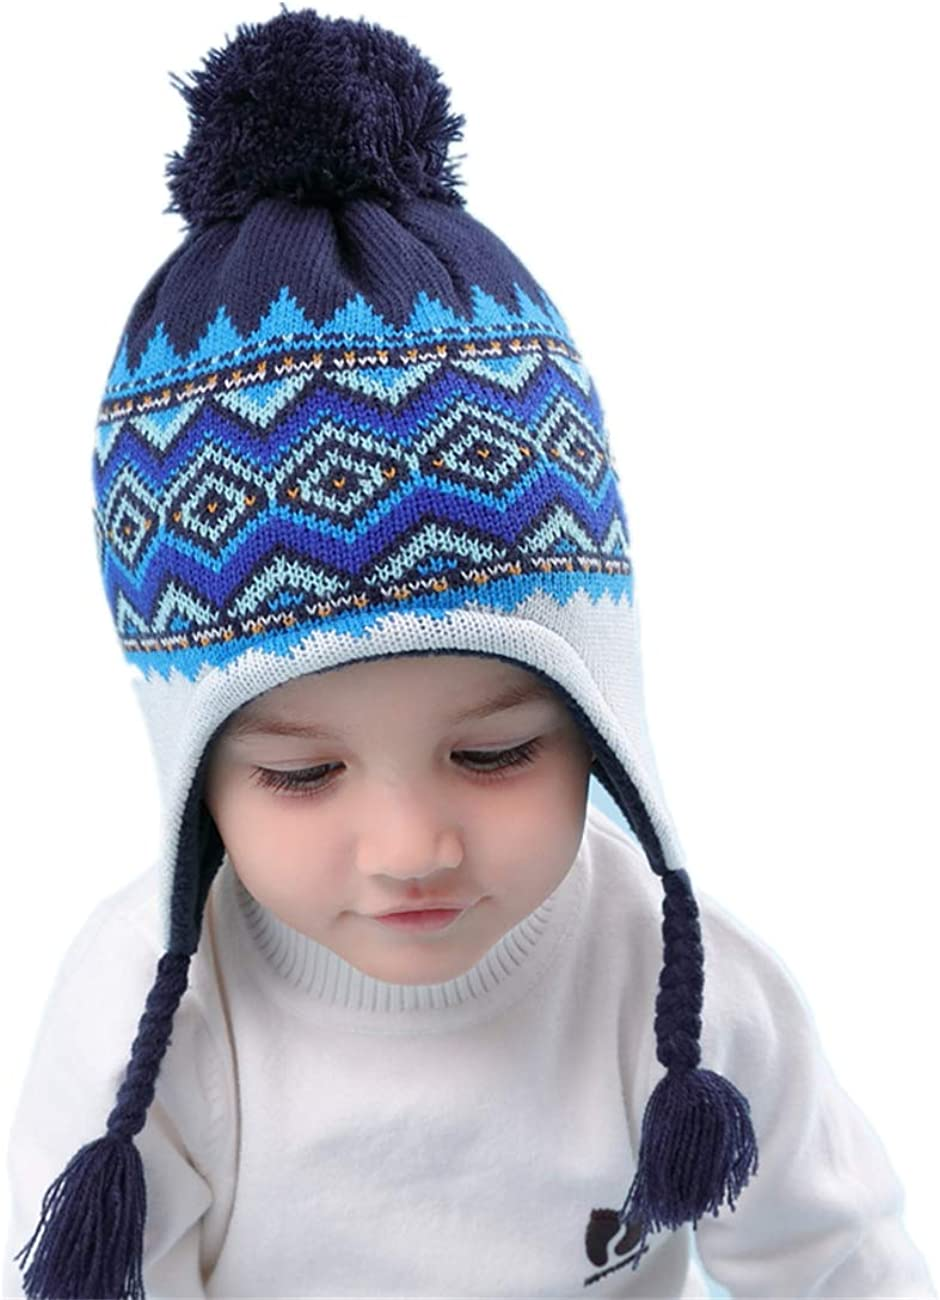 LLmoway Baby Toddler Winter Warm Hat with Ear Flaps Kid Fleece Knit Beanie Hats